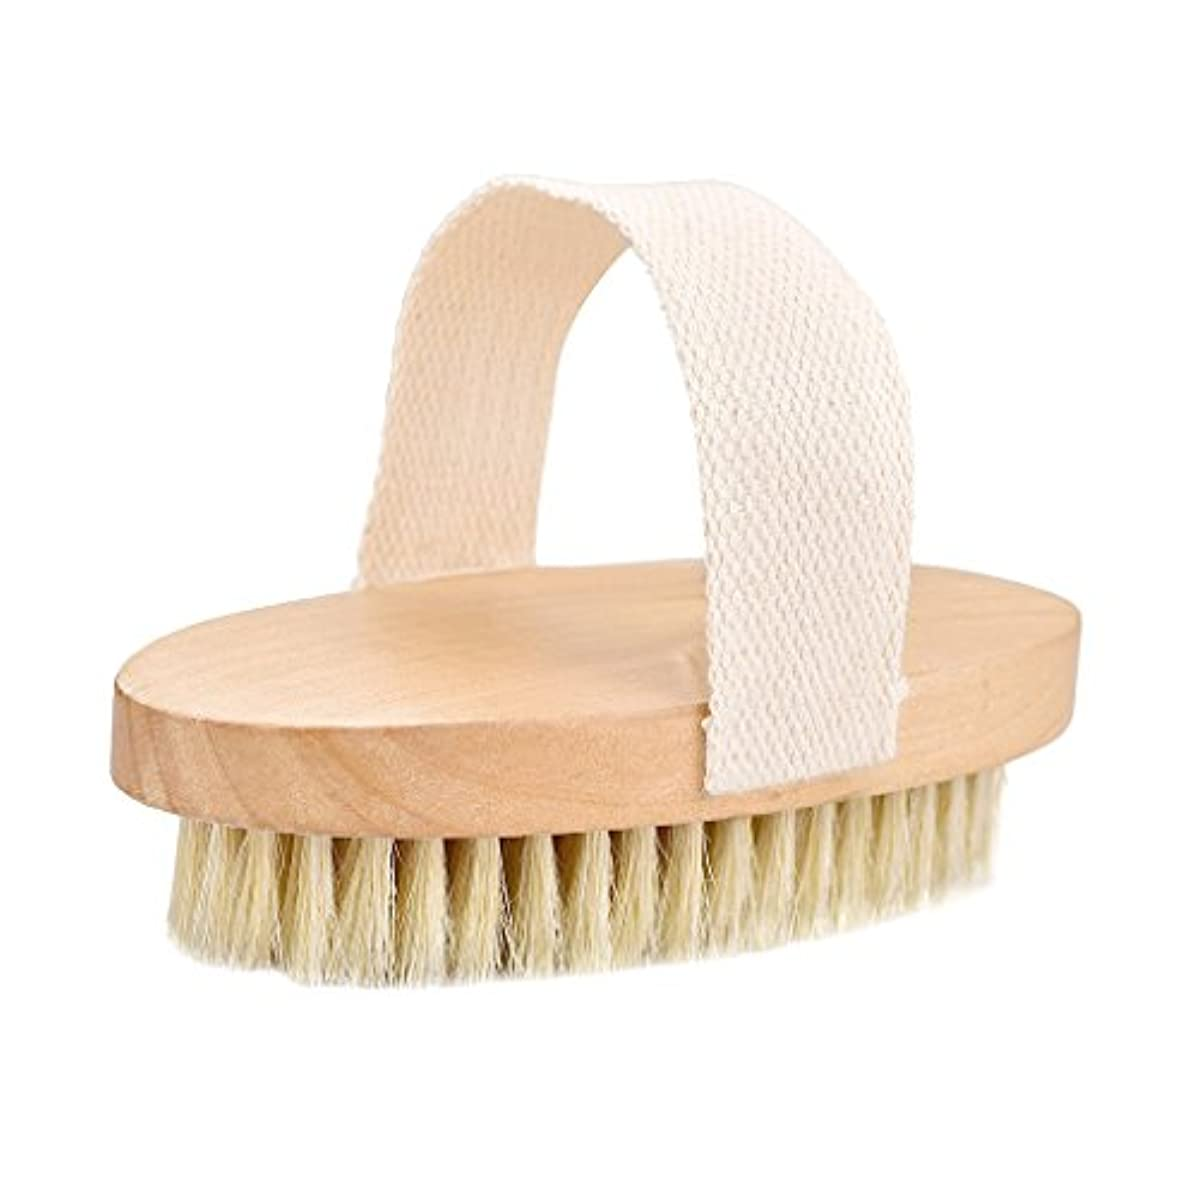 Tumao ボディブラシ 豚毛 ソフト 背中 お風呂用 角質除去 全身マッサージ 血行促進 体洗いブラシ バスグッズ